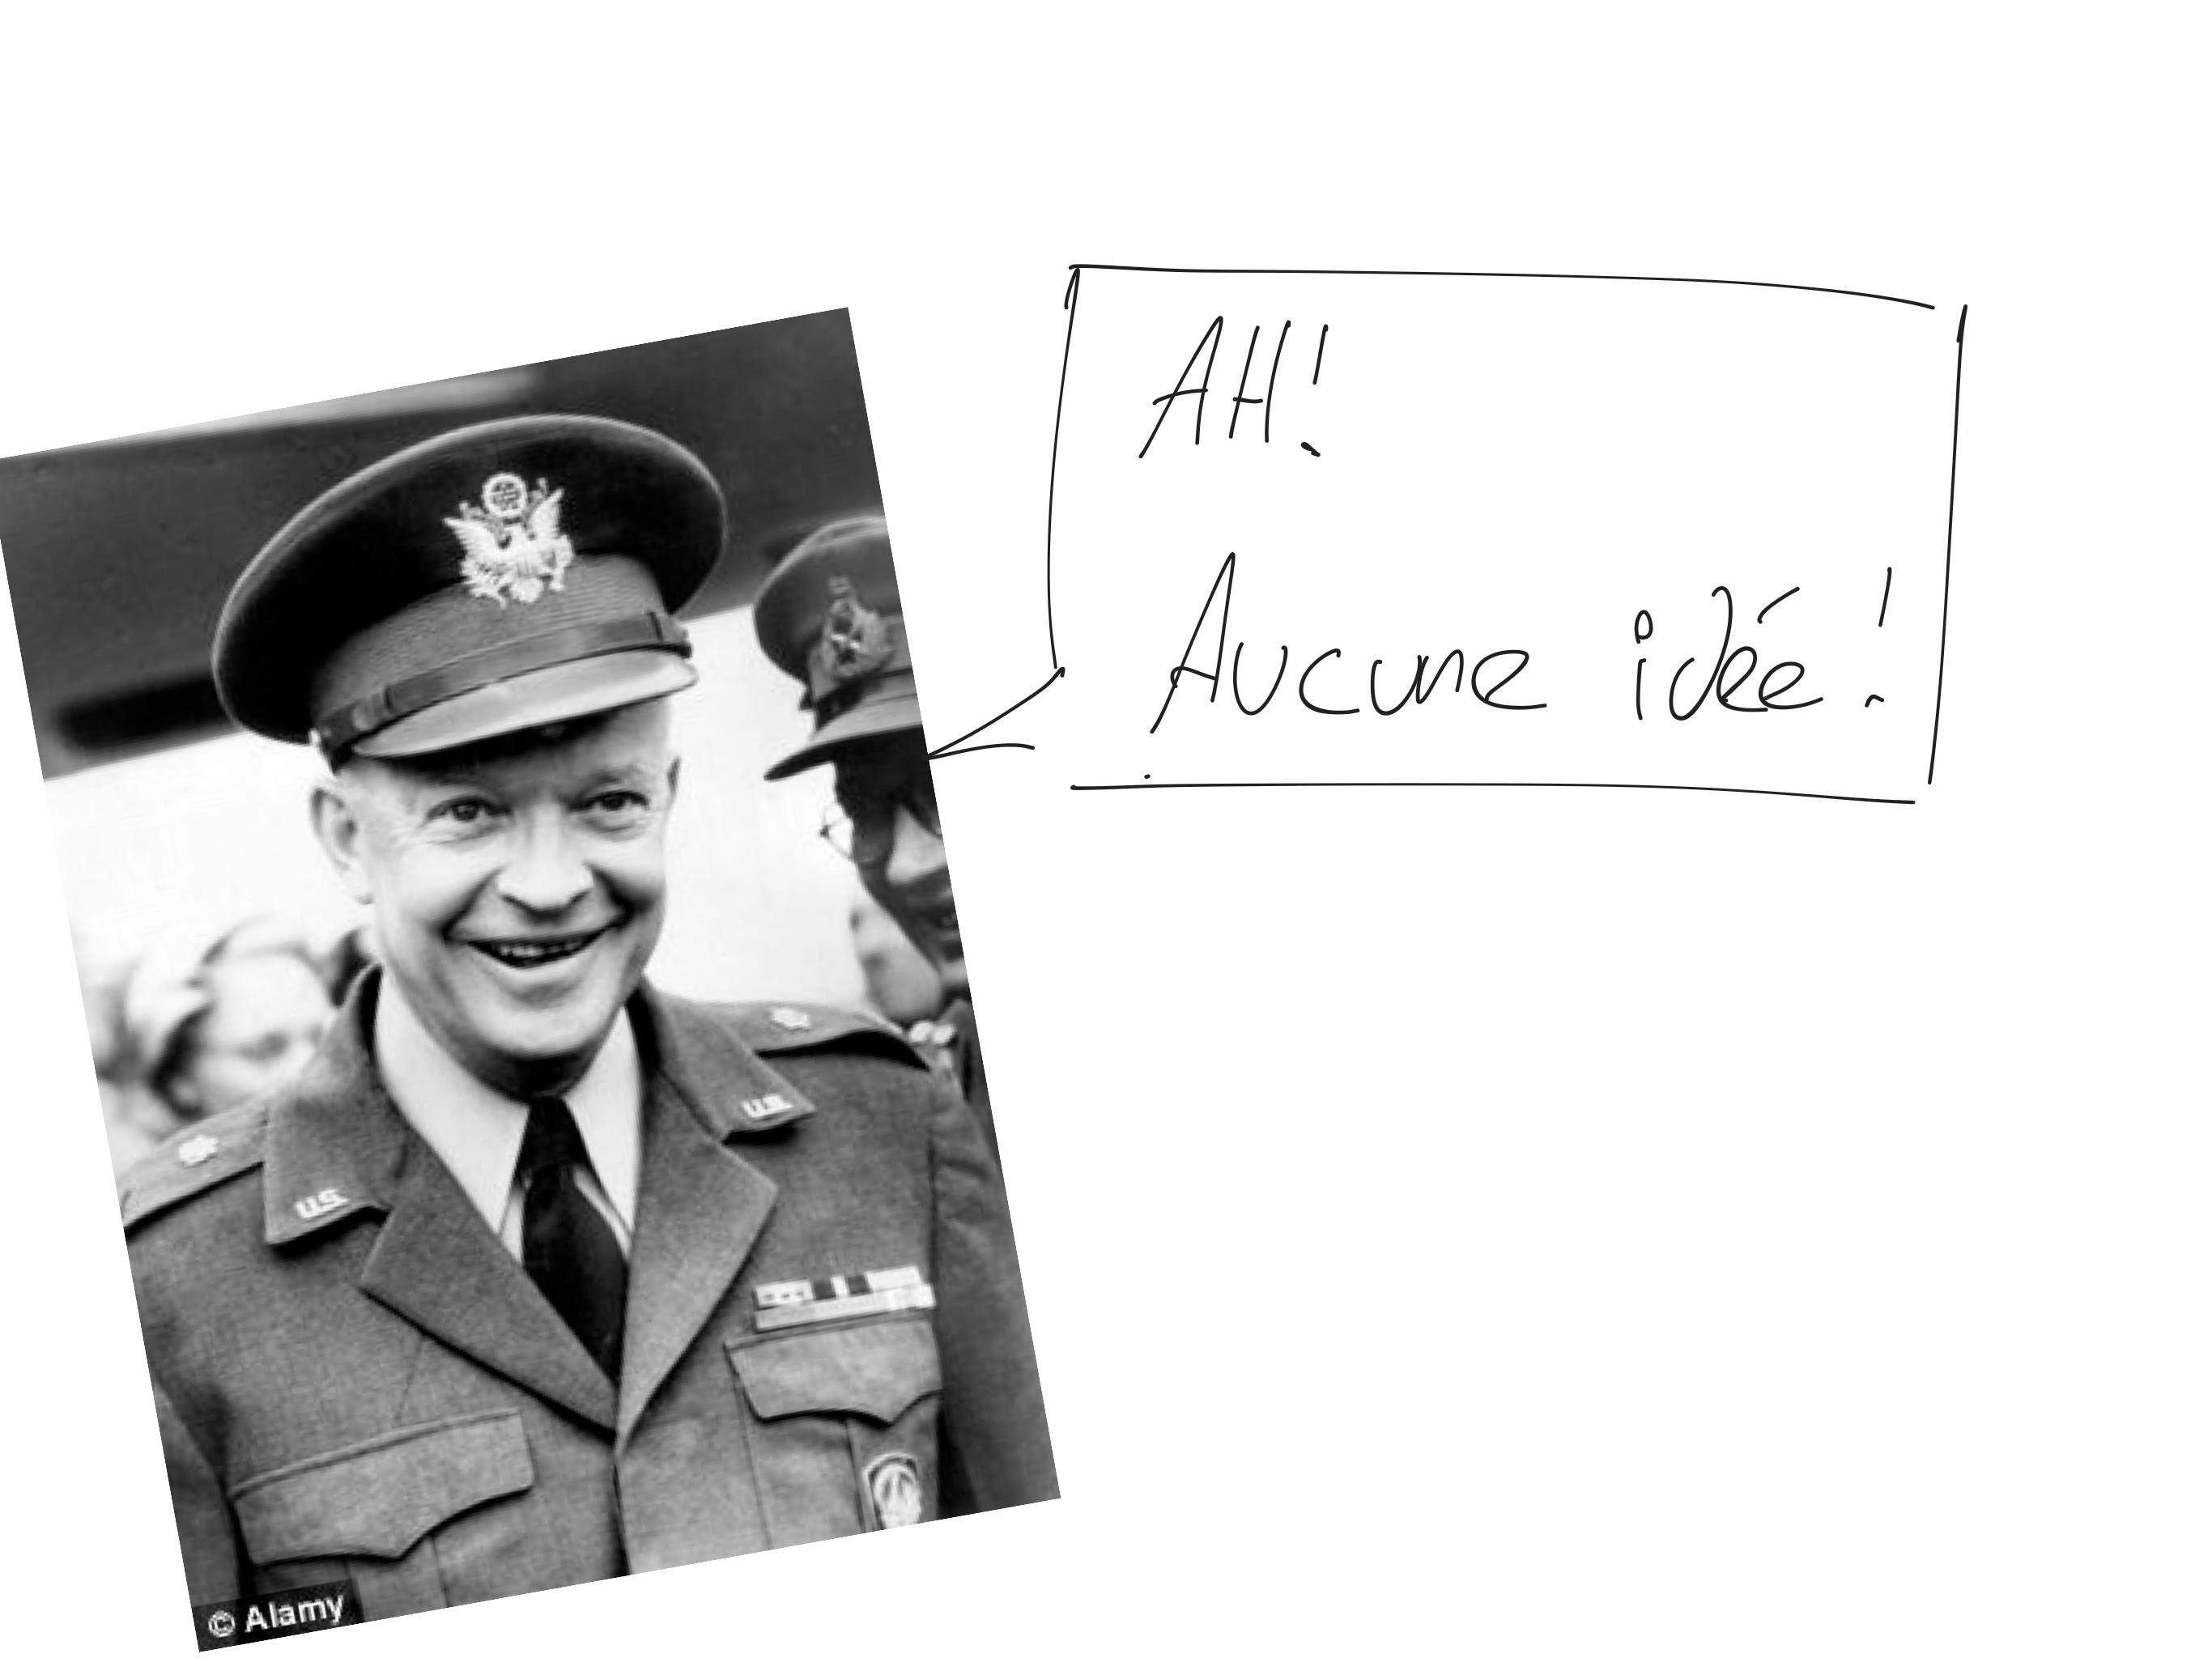 Président Dwight D. Eisenhower